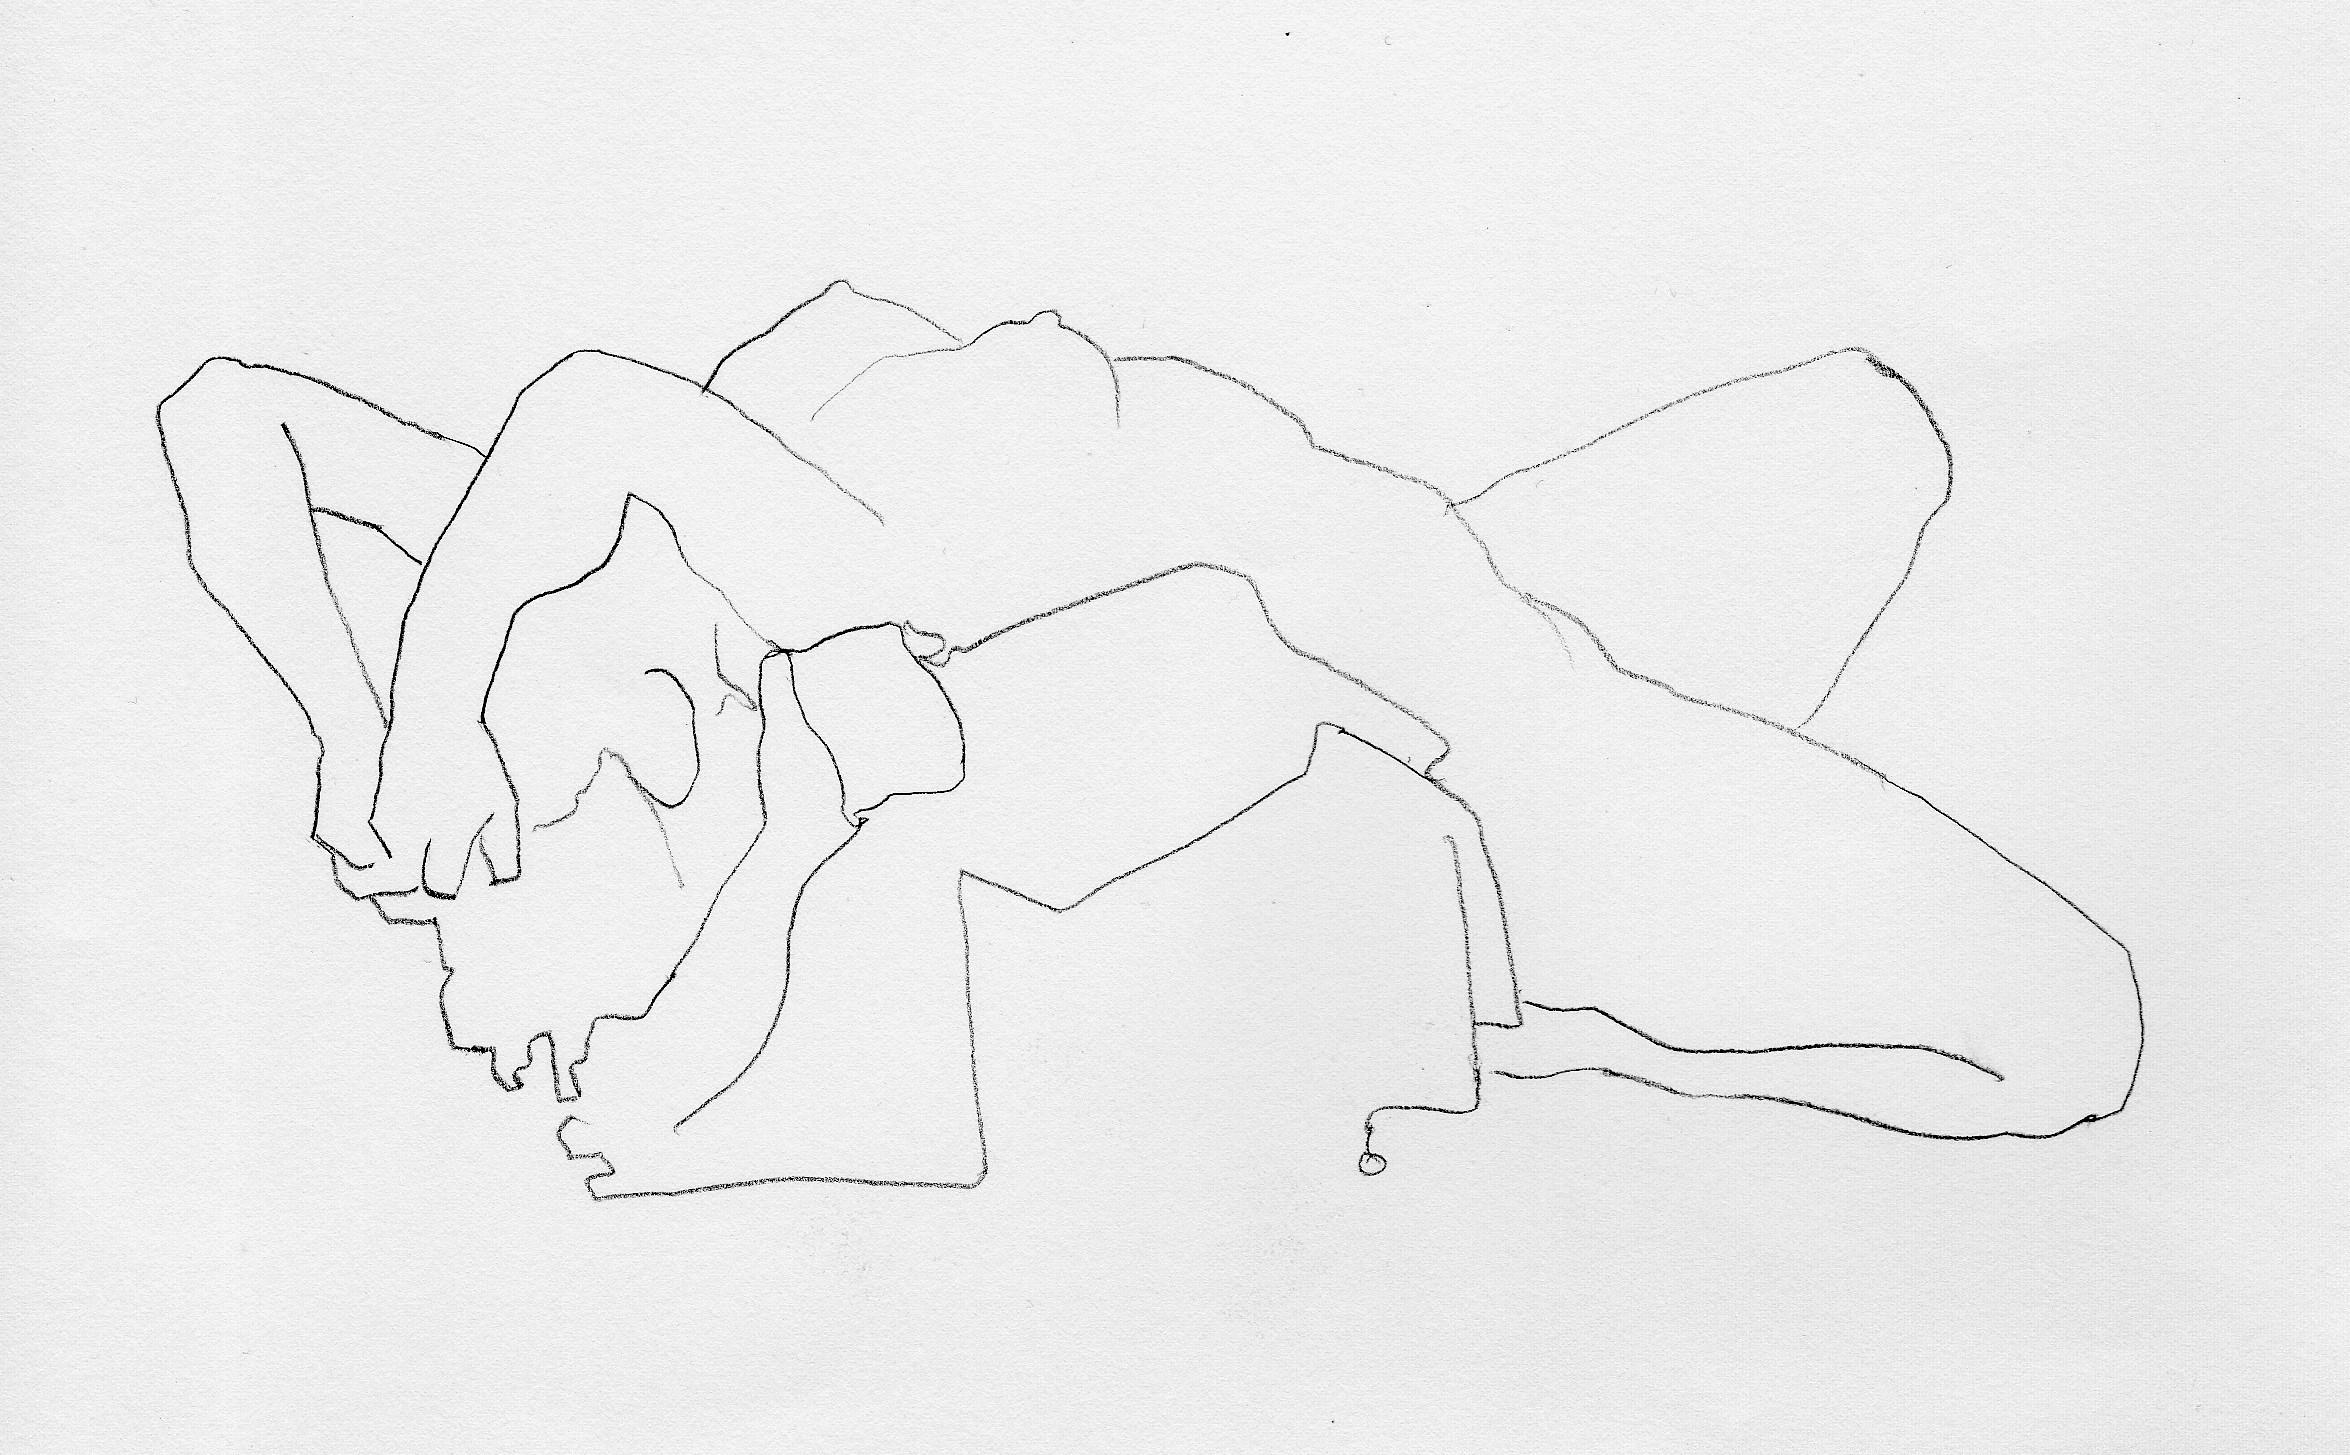 2016_Sketch_F-Beudin_Angelique_01